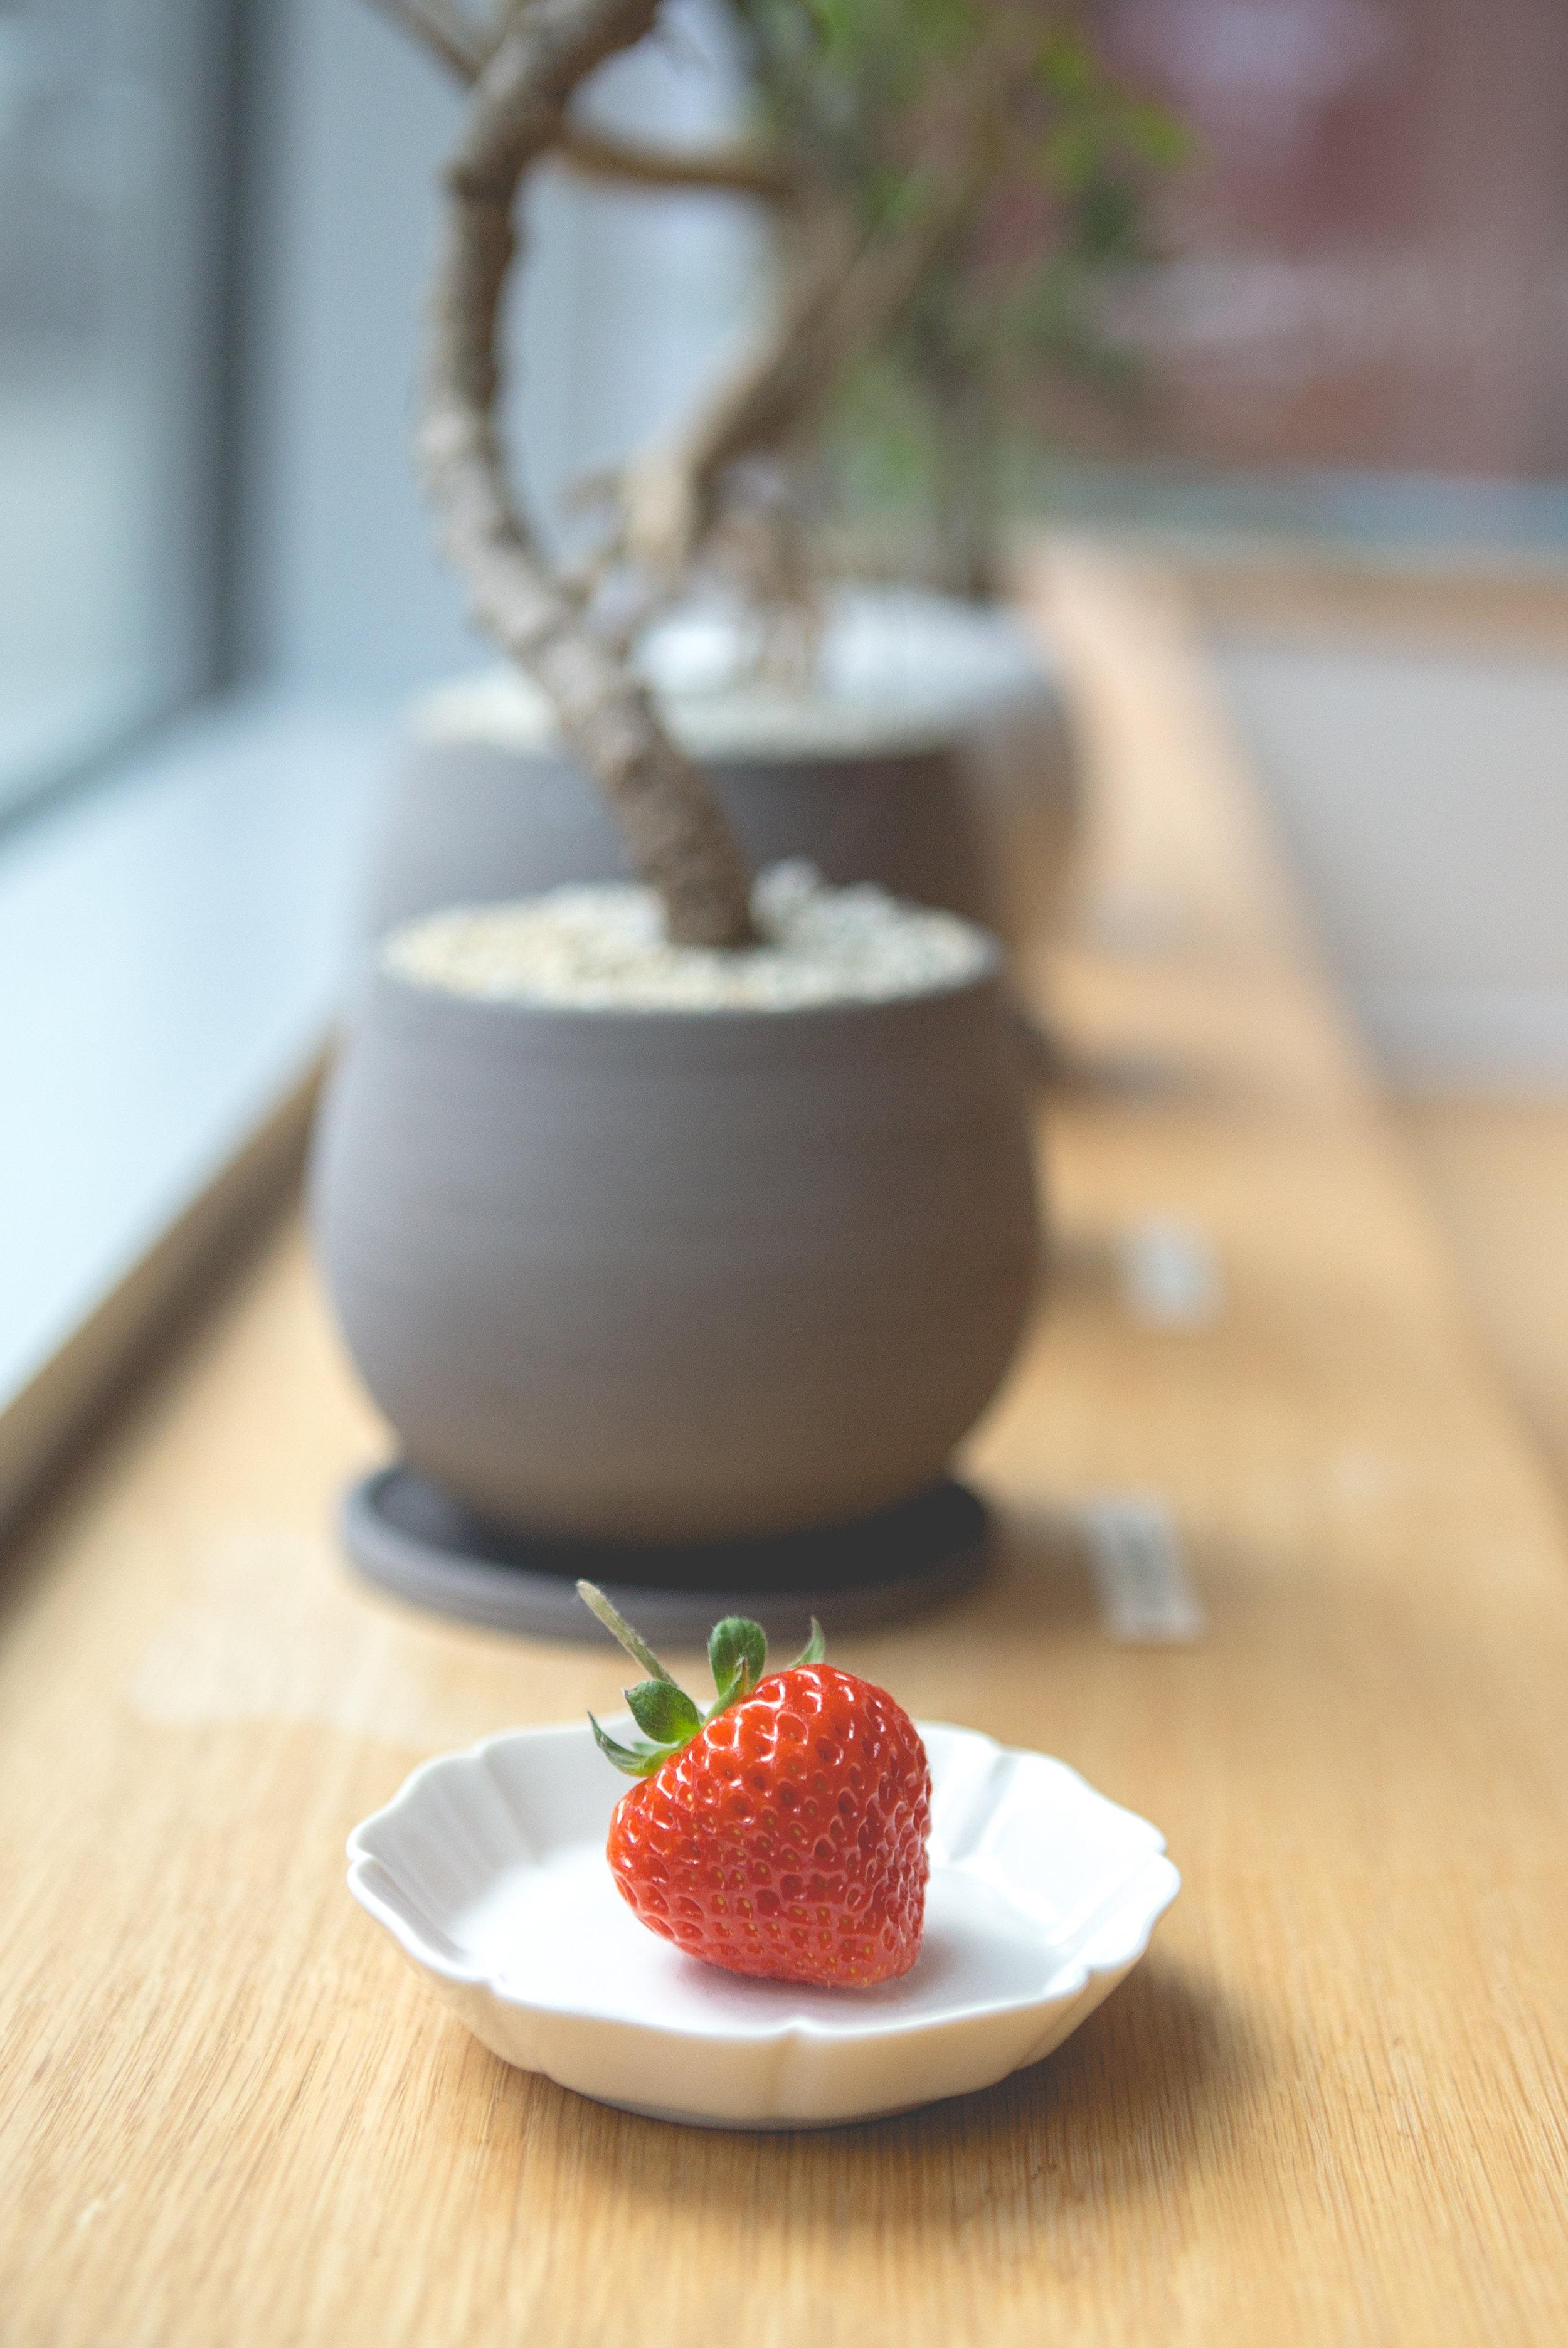 Japanese heritage and craftsmanship.  We admire Nalata Nalata's commitment to telling the stories behind Japanese artisans.  Happy 4th anniversary to the folks at  @nalatanalata !   #oishiiberry   #strawberry  #thepursuitofperfection   #オイシイベリー